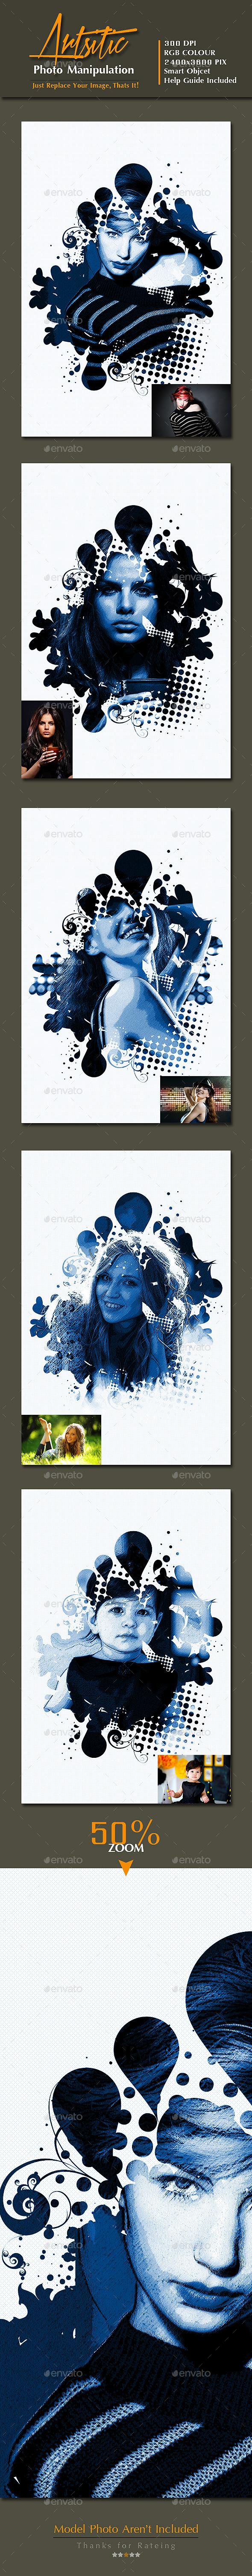 Artistic Photo Manipulation vol. 3 - Photo Templates Graphics